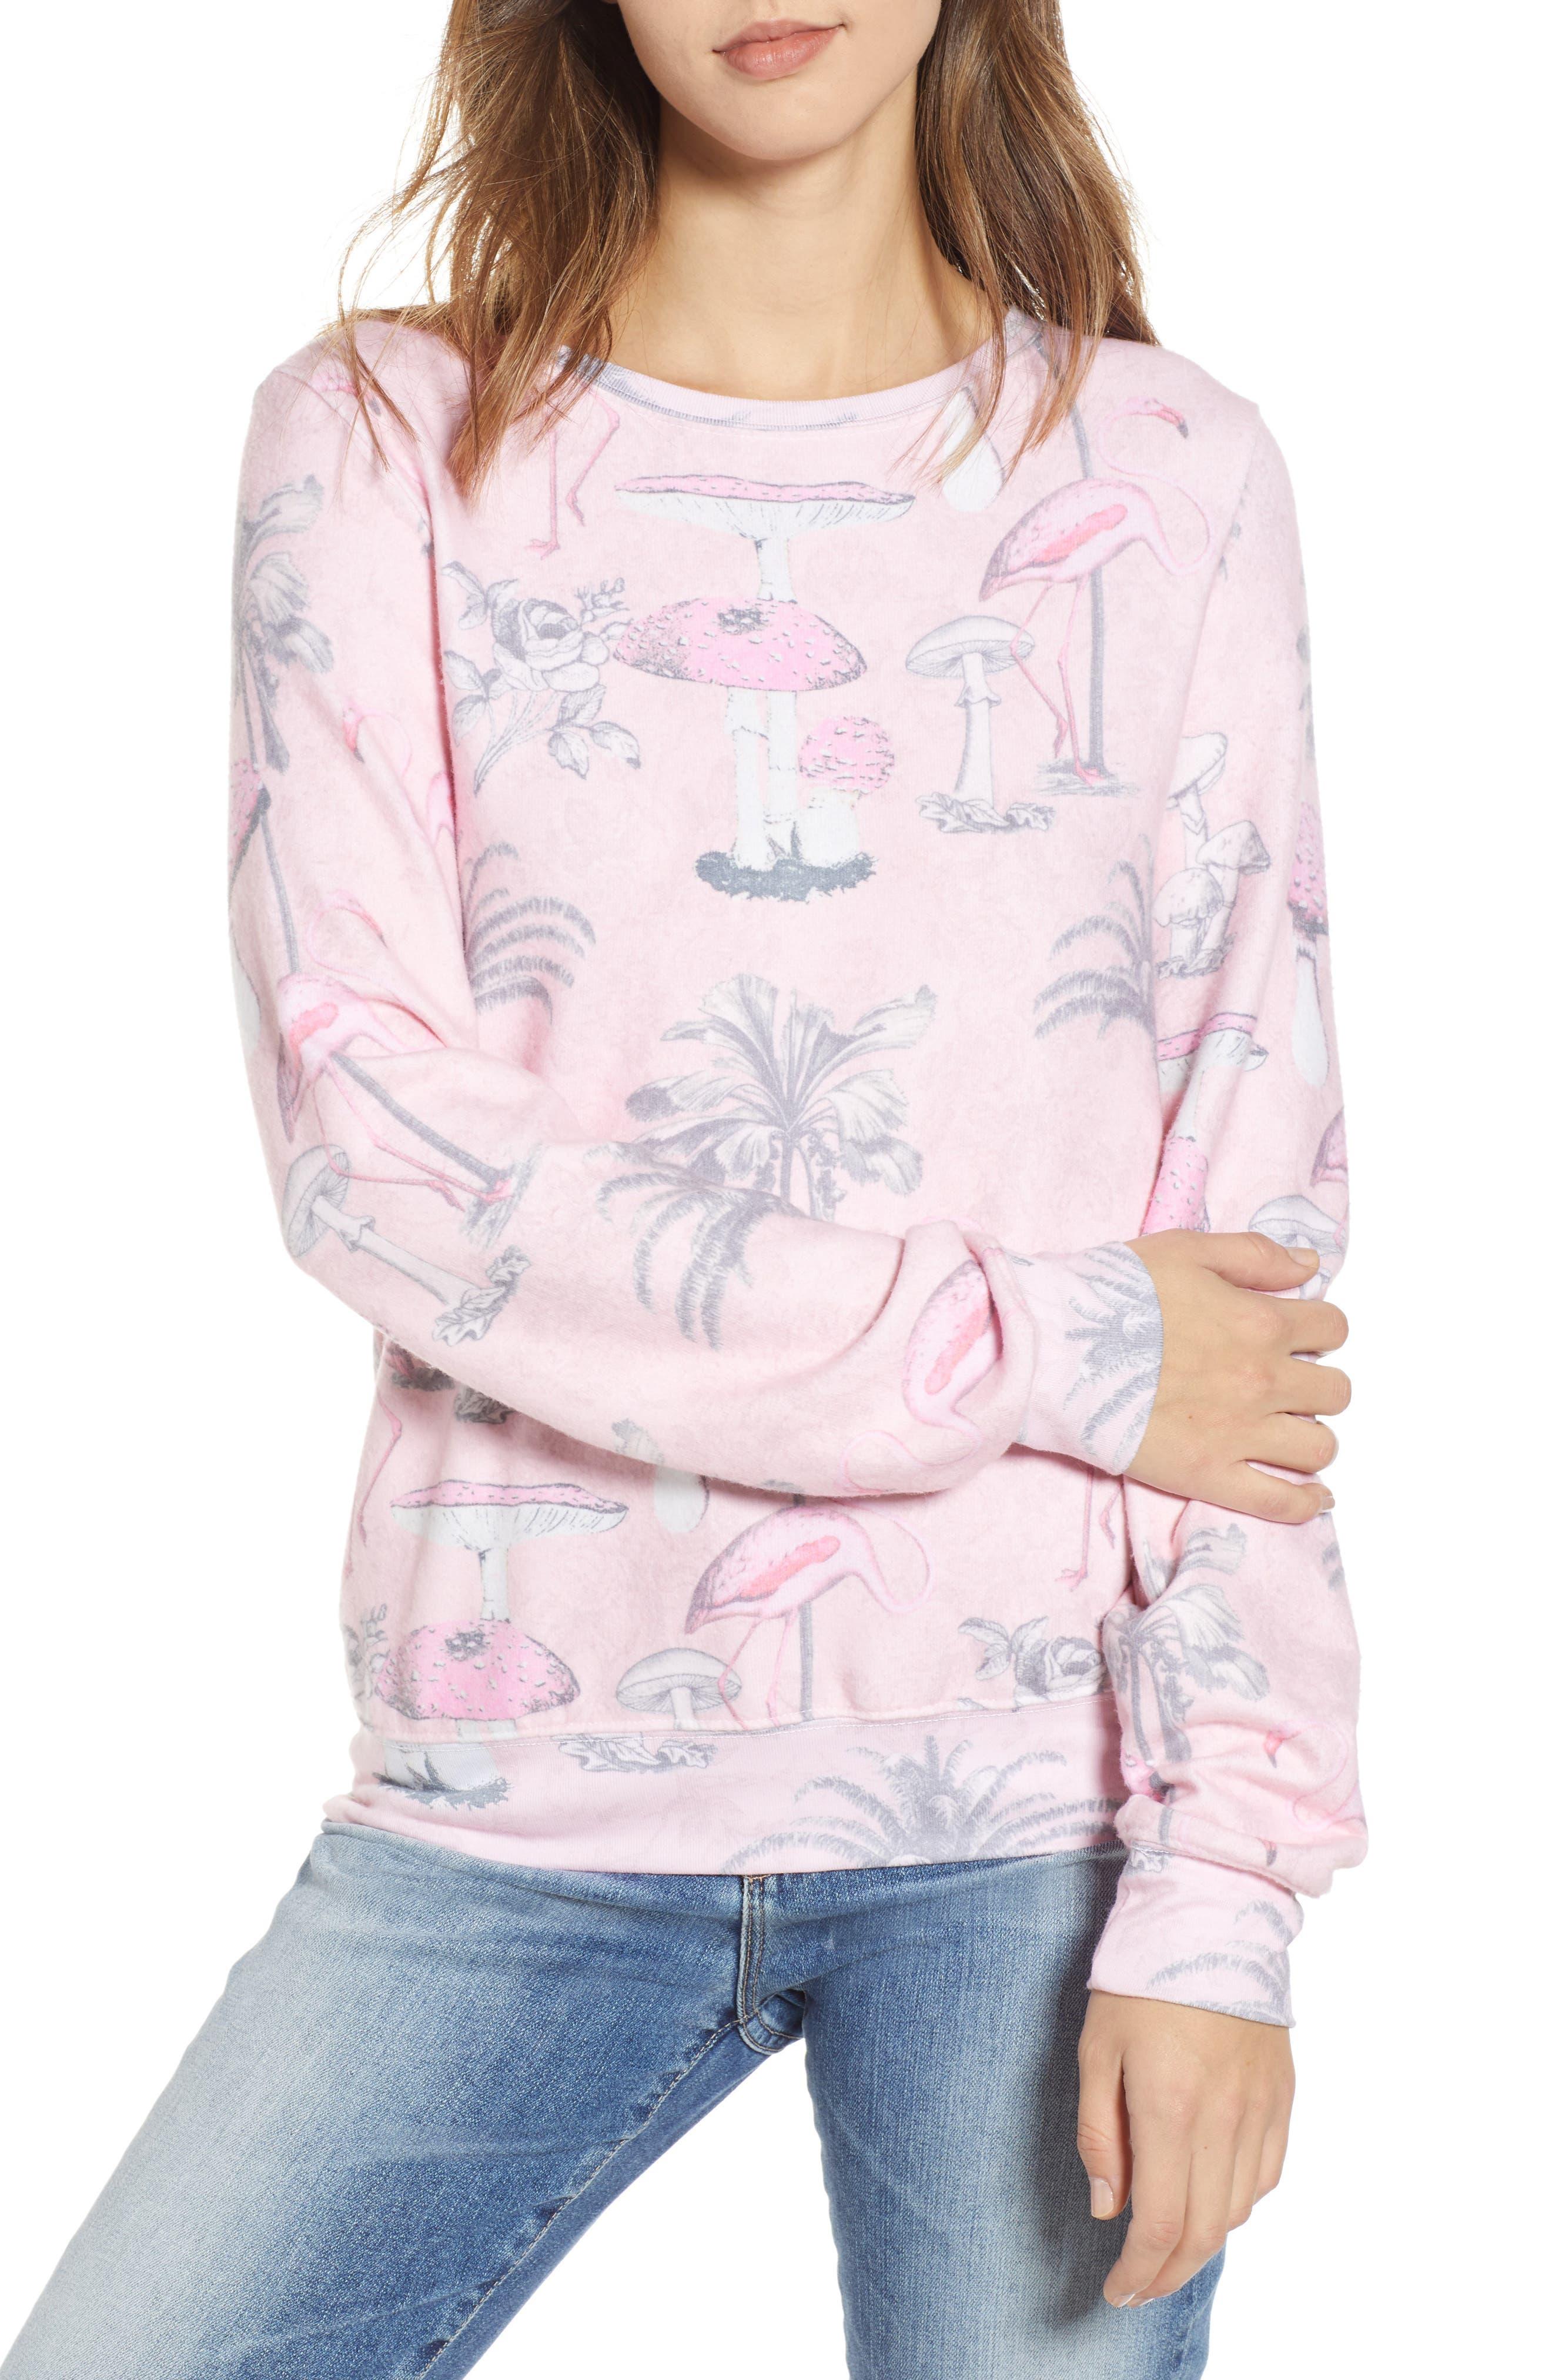 WILDFOX Pink Paradise Print Sweatshirt in Multi